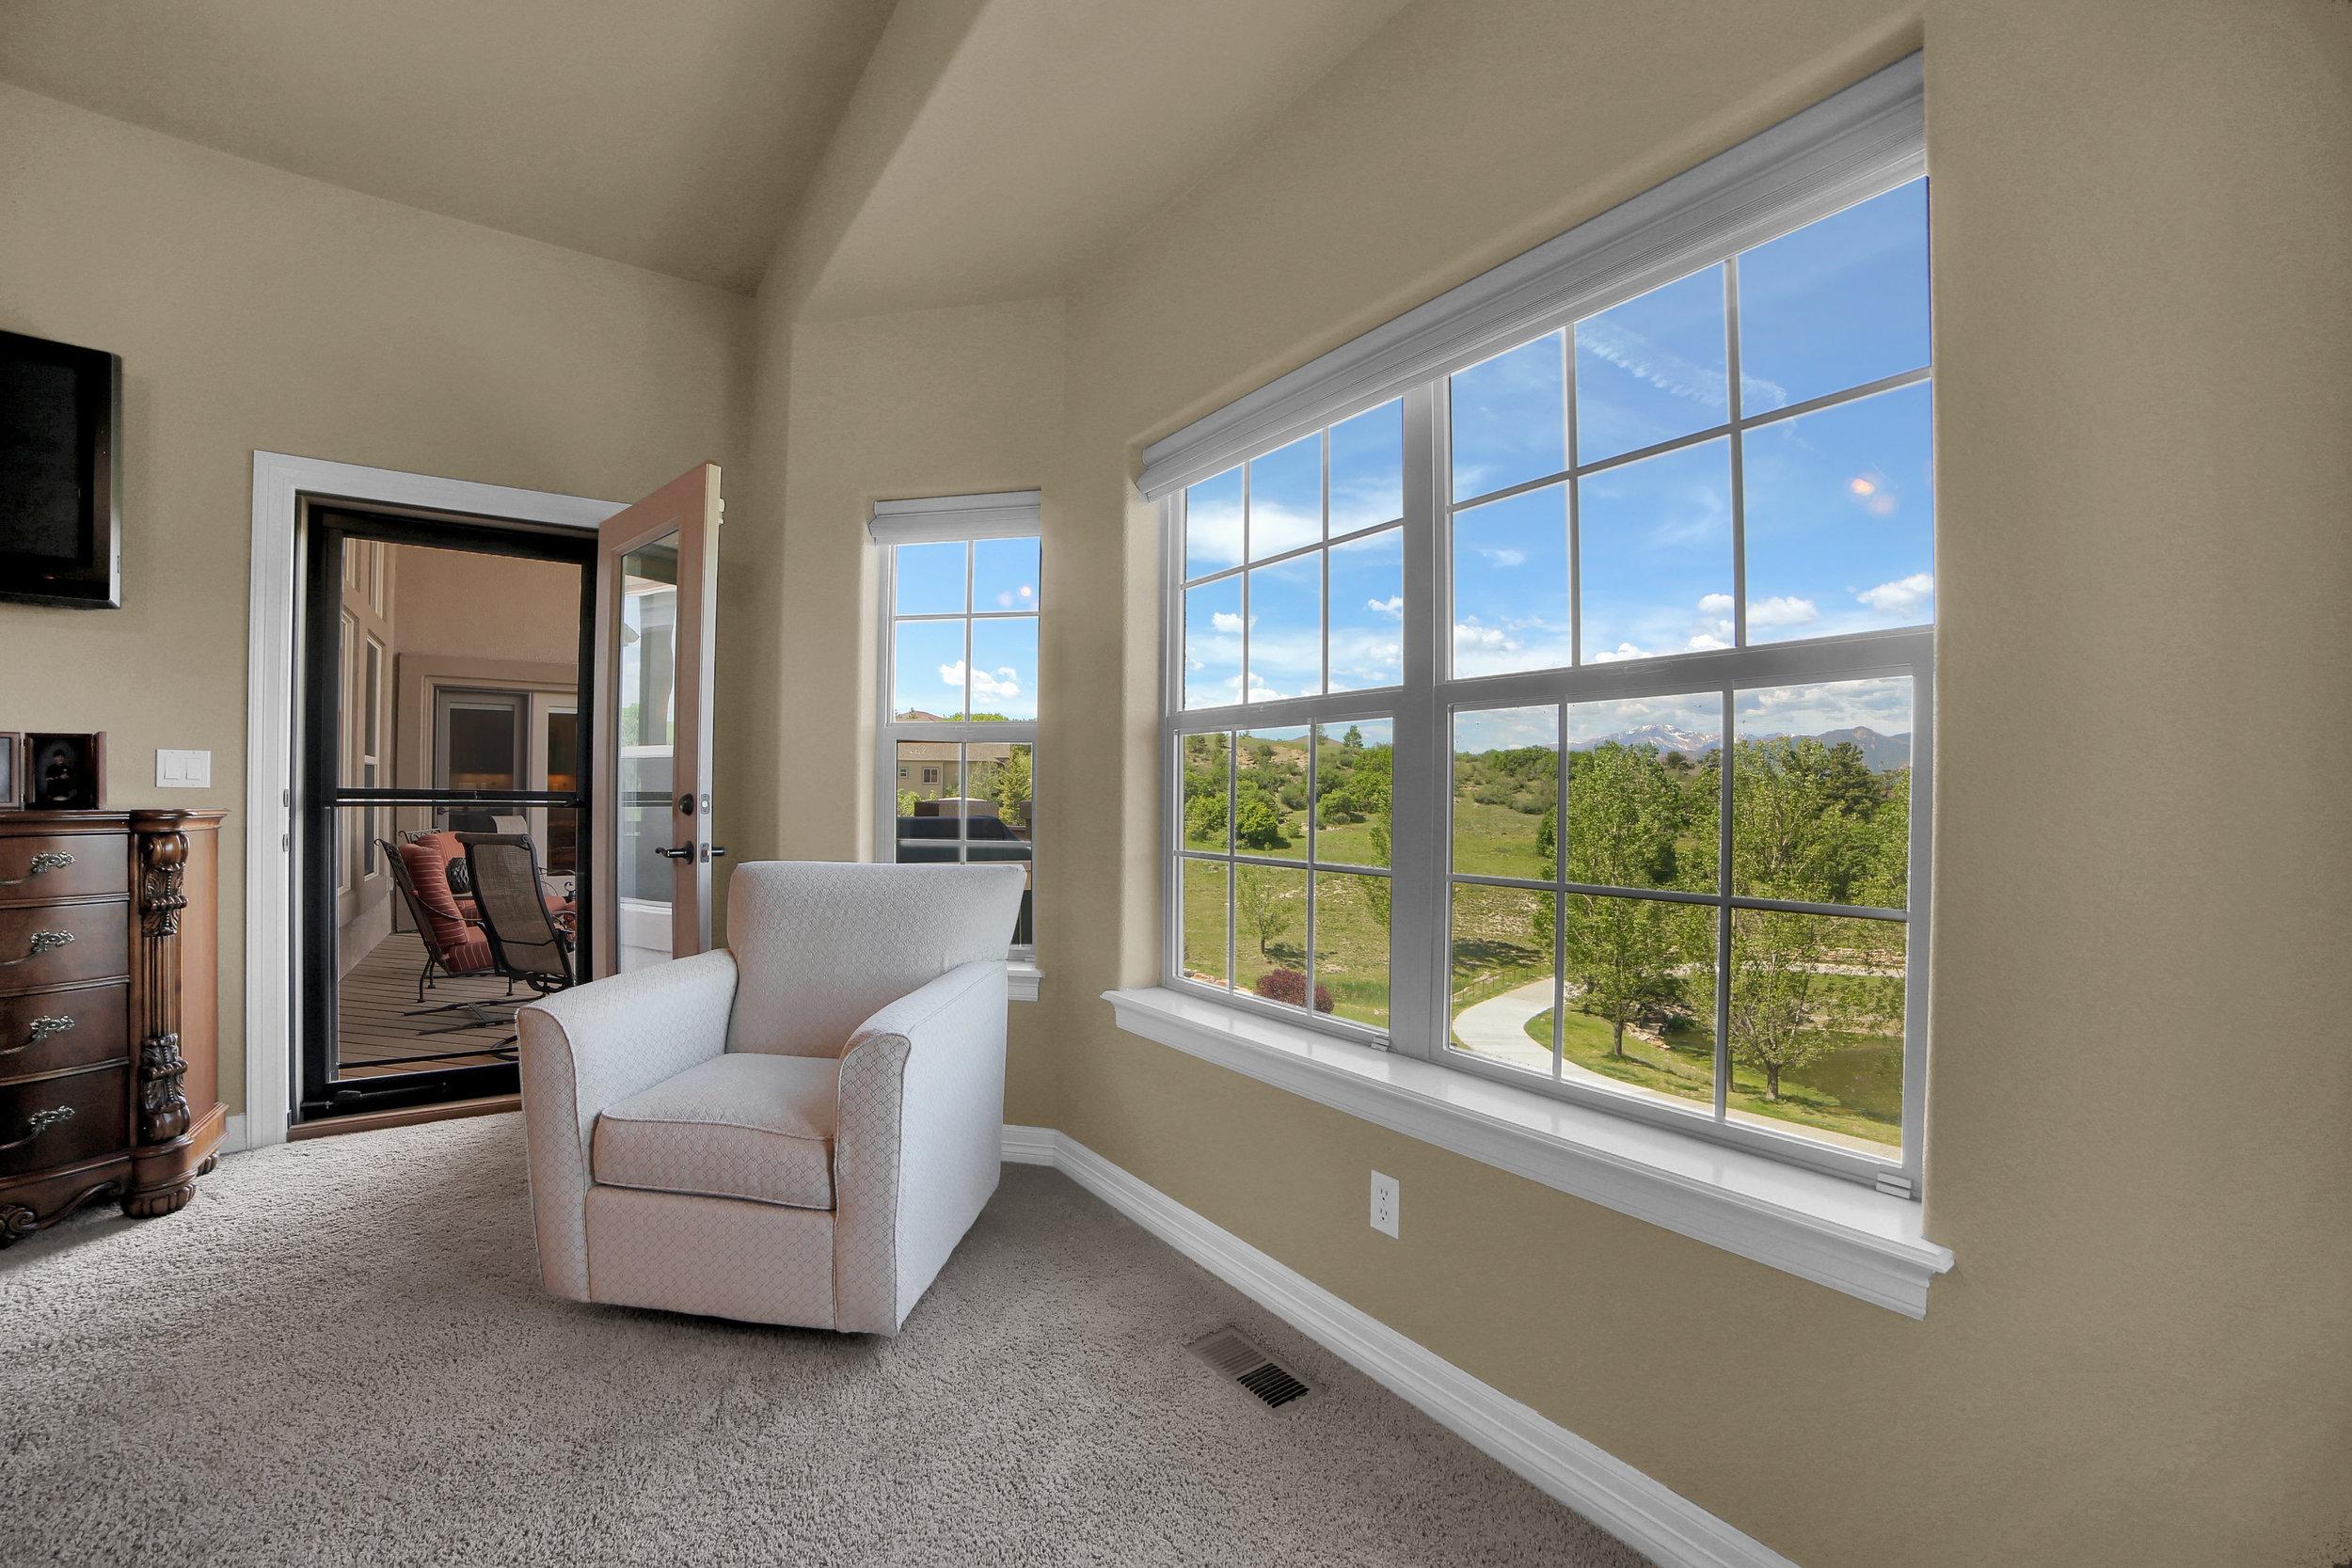 12496 Creekhurst Dr Colorado-print-054-036-Sitting Room-3648x2432-300dpi.jpg